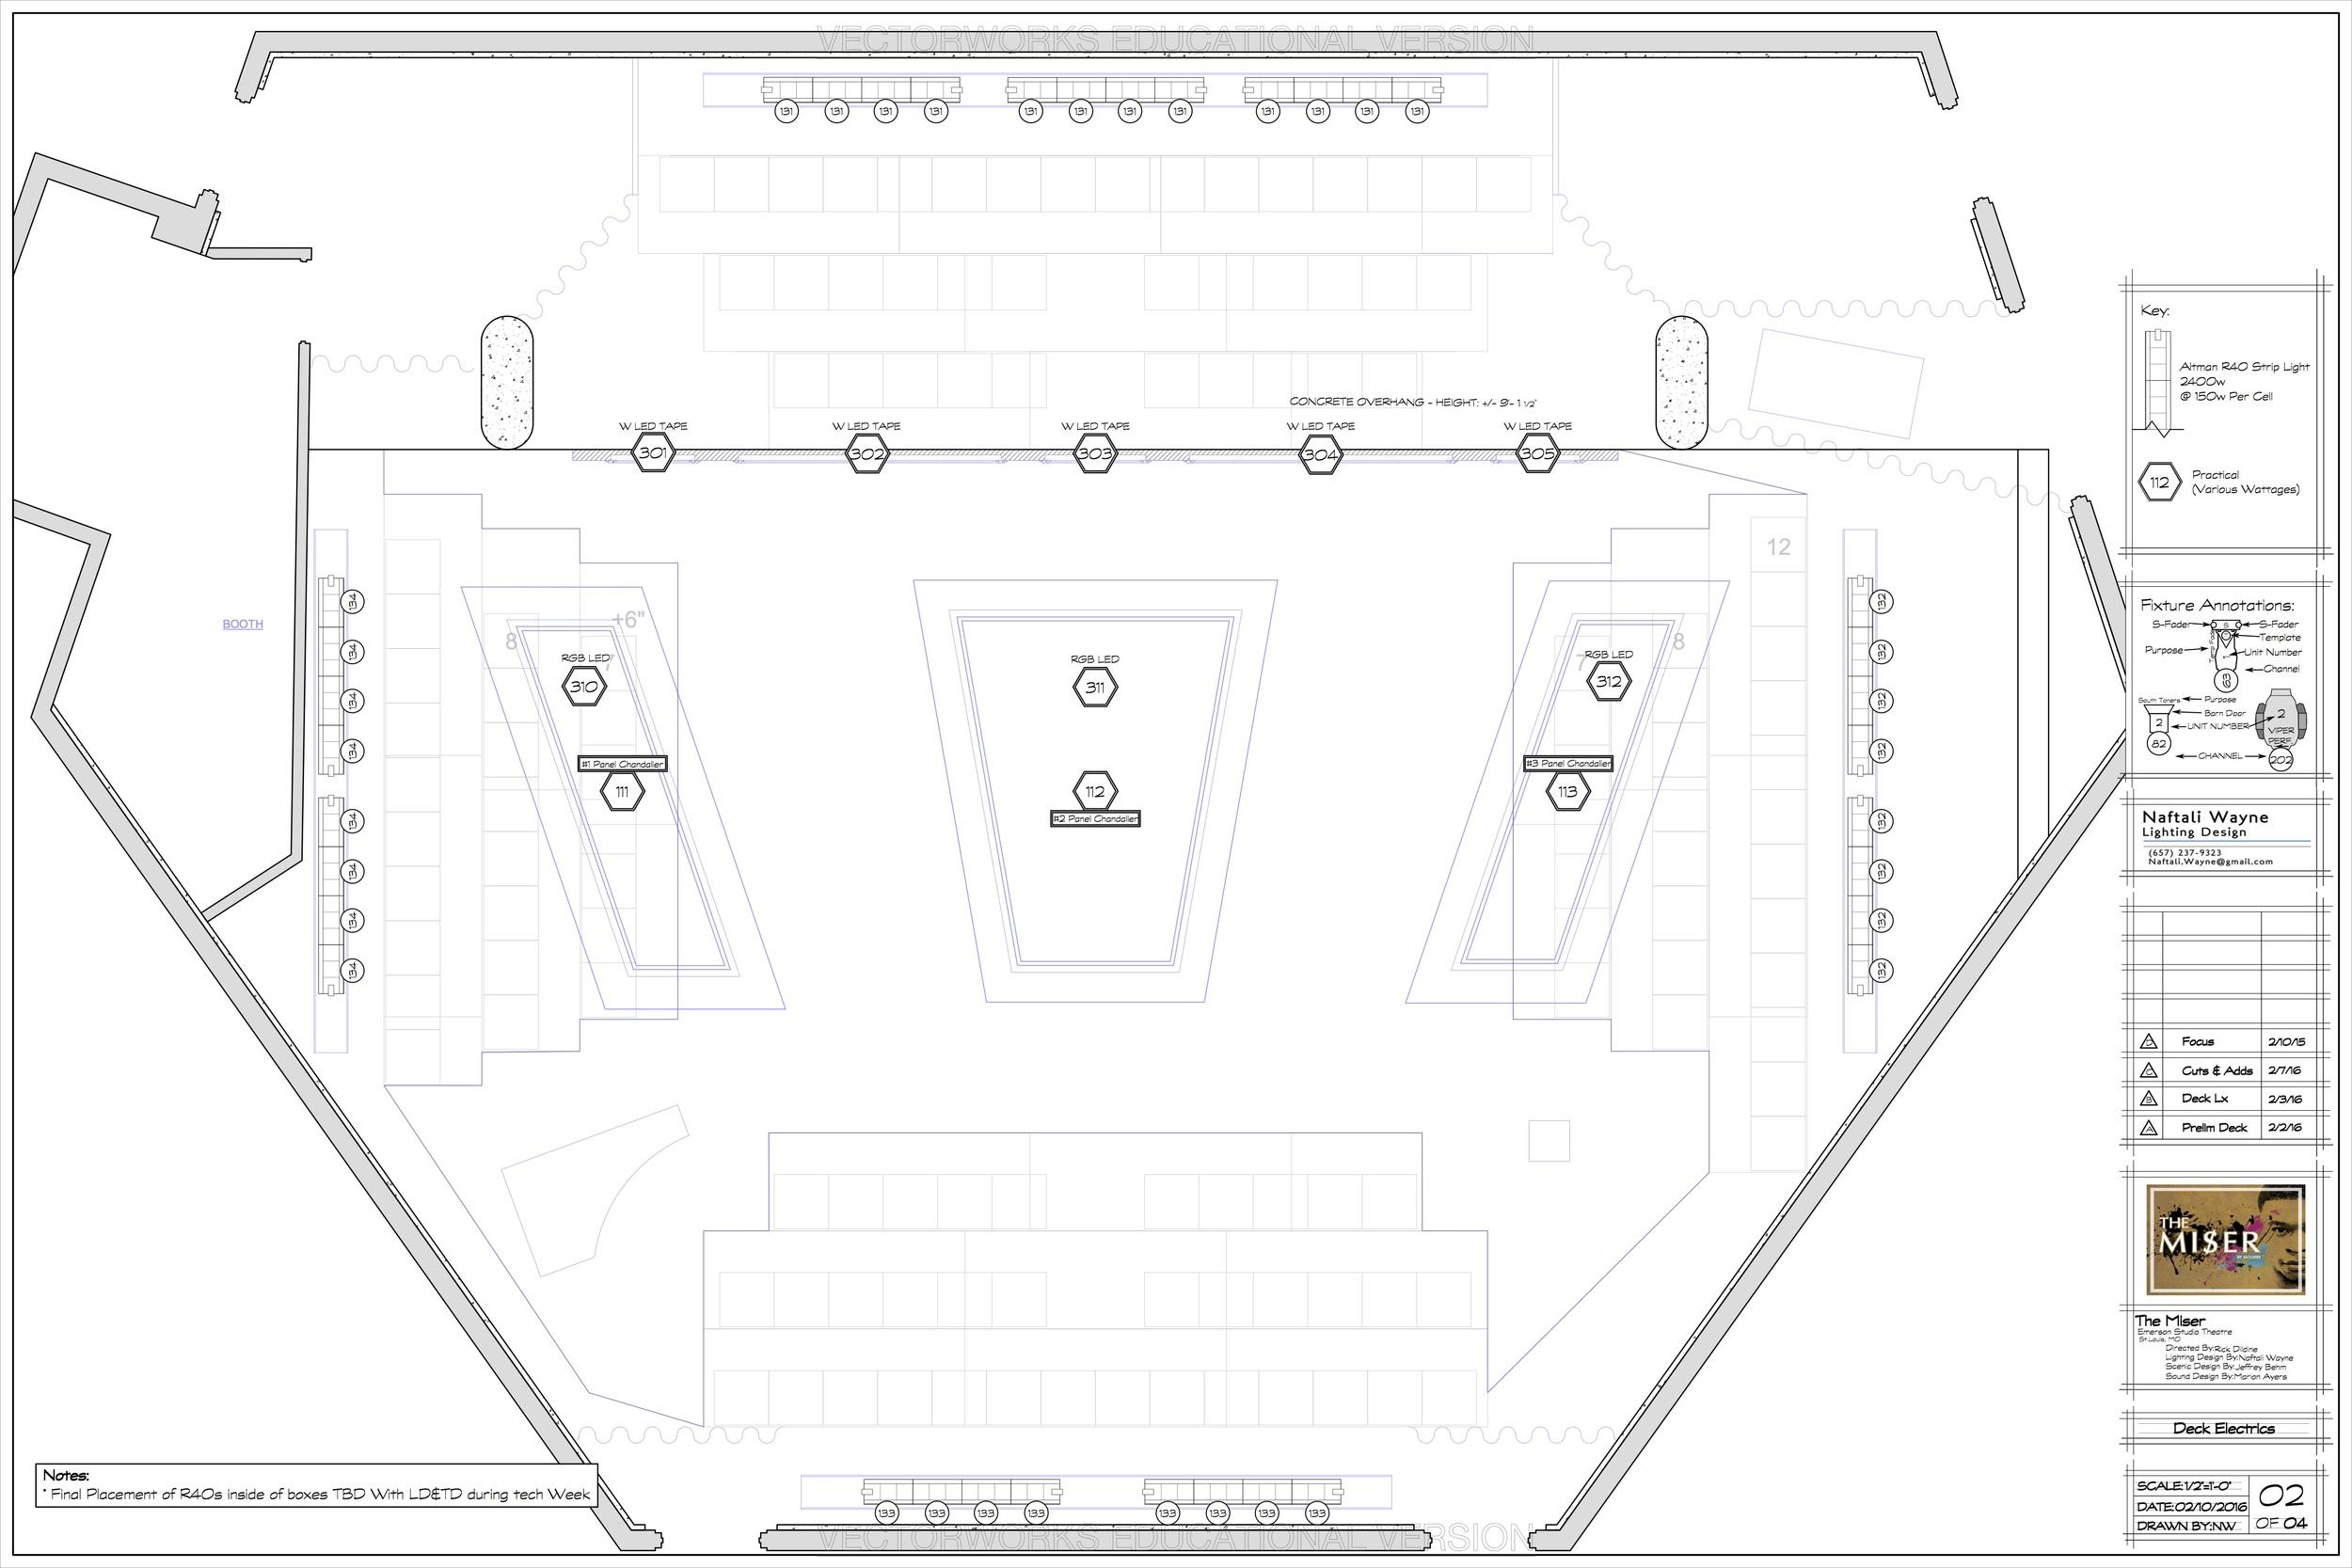 Deck Electrics - The Miser - Emerson Studio Theatre - St. Louis MO